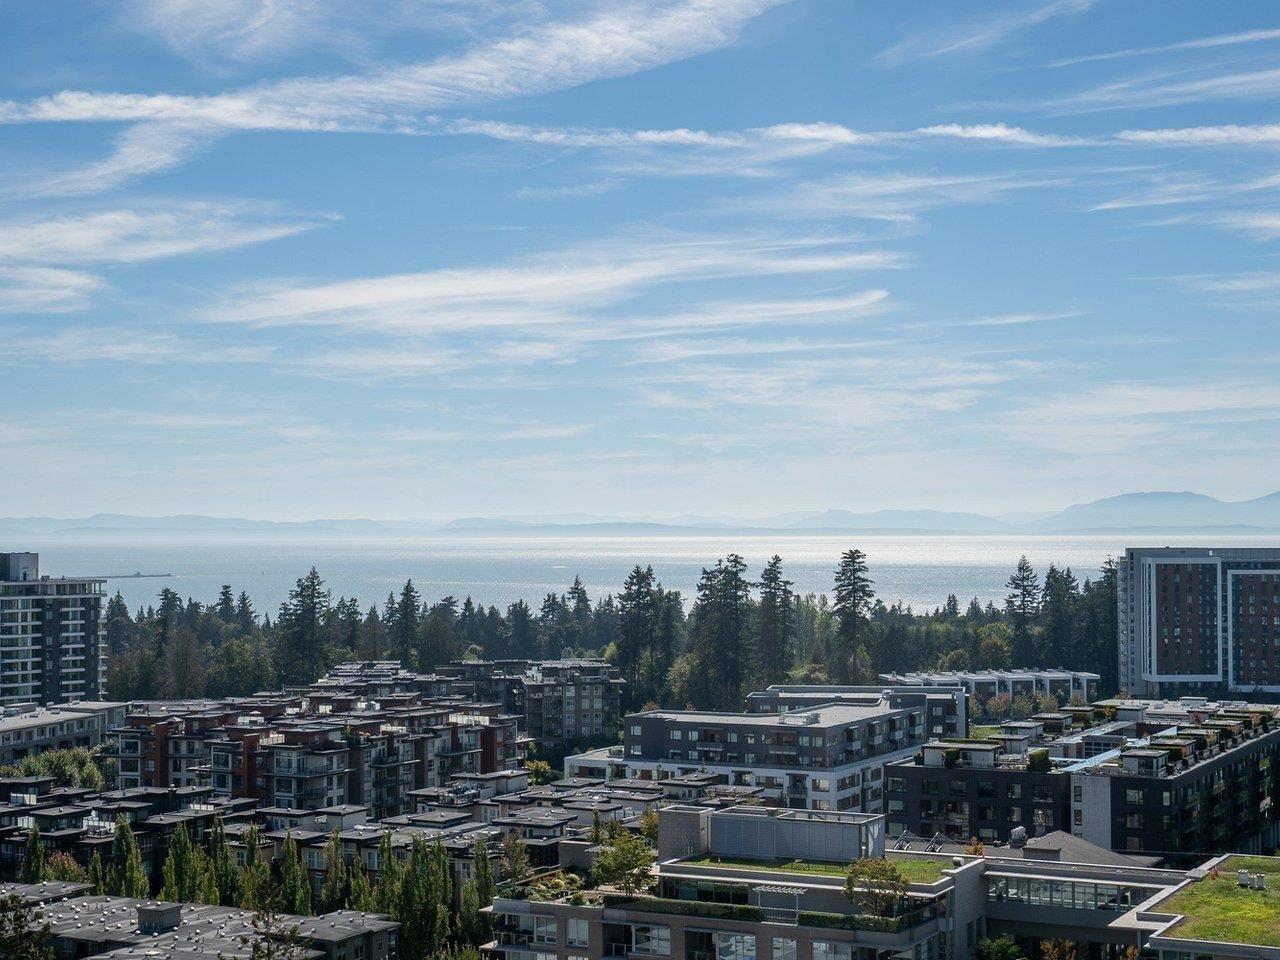 "Main Photo: 2003 5728 BERTON Avenue in Vancouver: University VW Condo for sale in ""ACADEMY"" (Vancouver West)  : MLS®# R2615483"